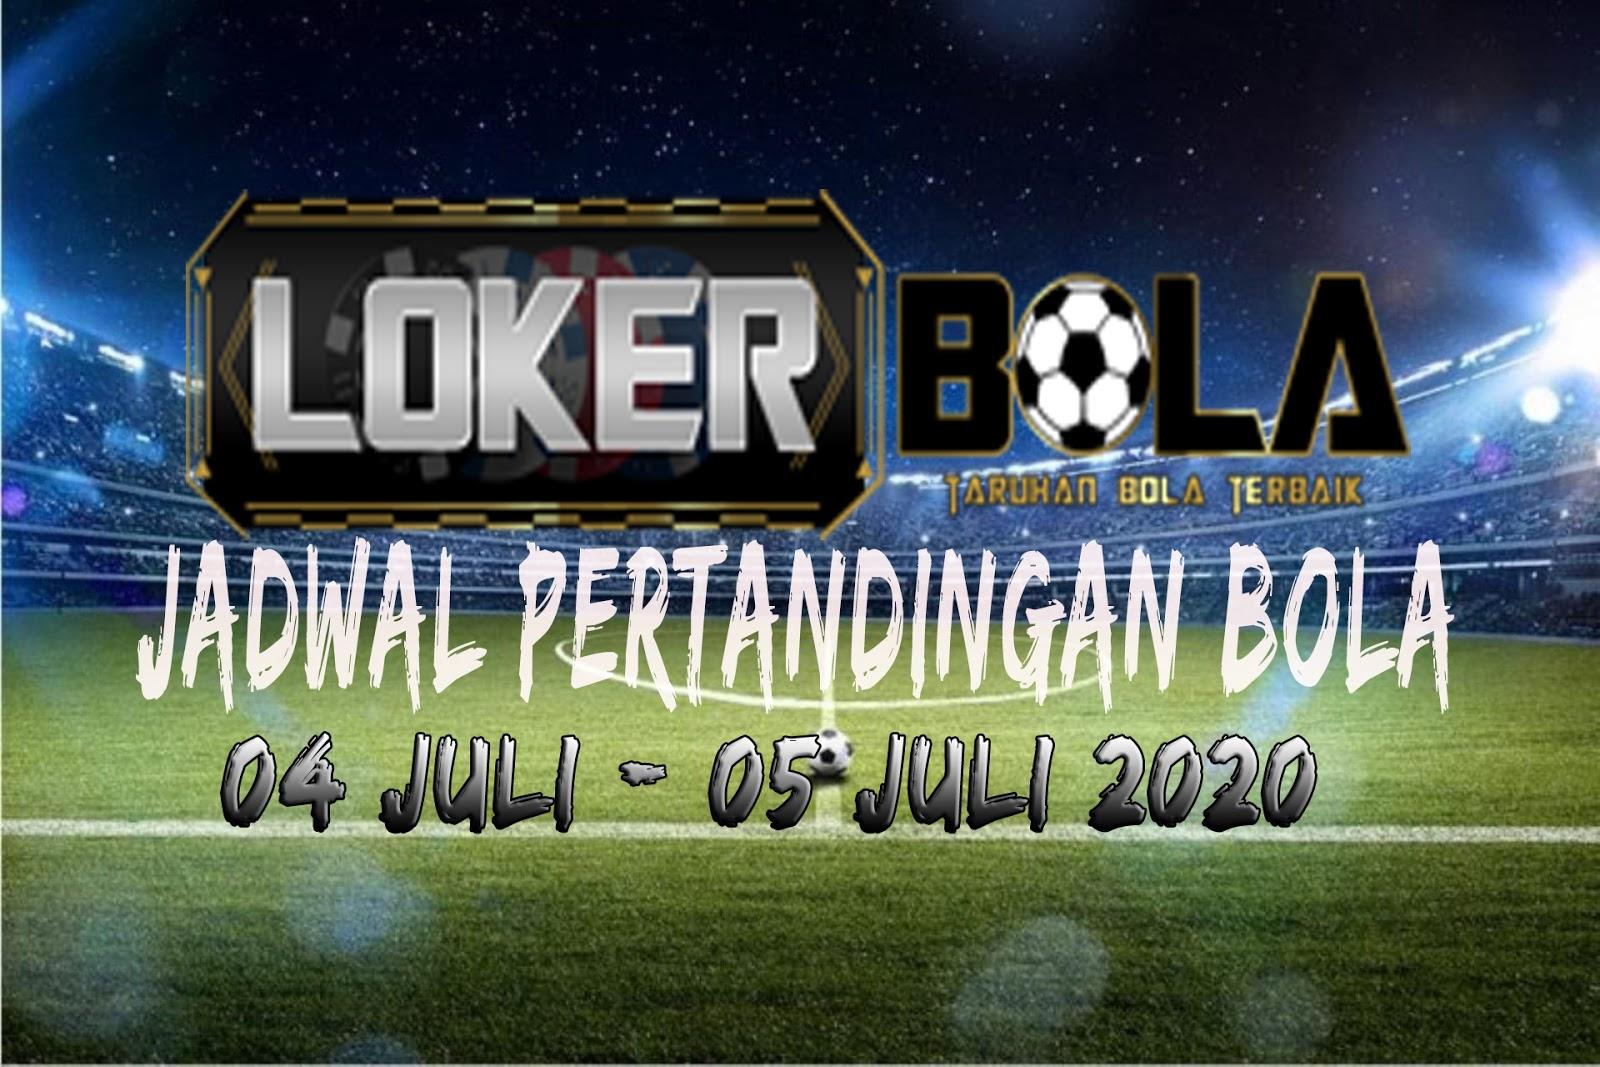 JADWAL PERTANDINGAN BOLA 04-05 JULI 2020